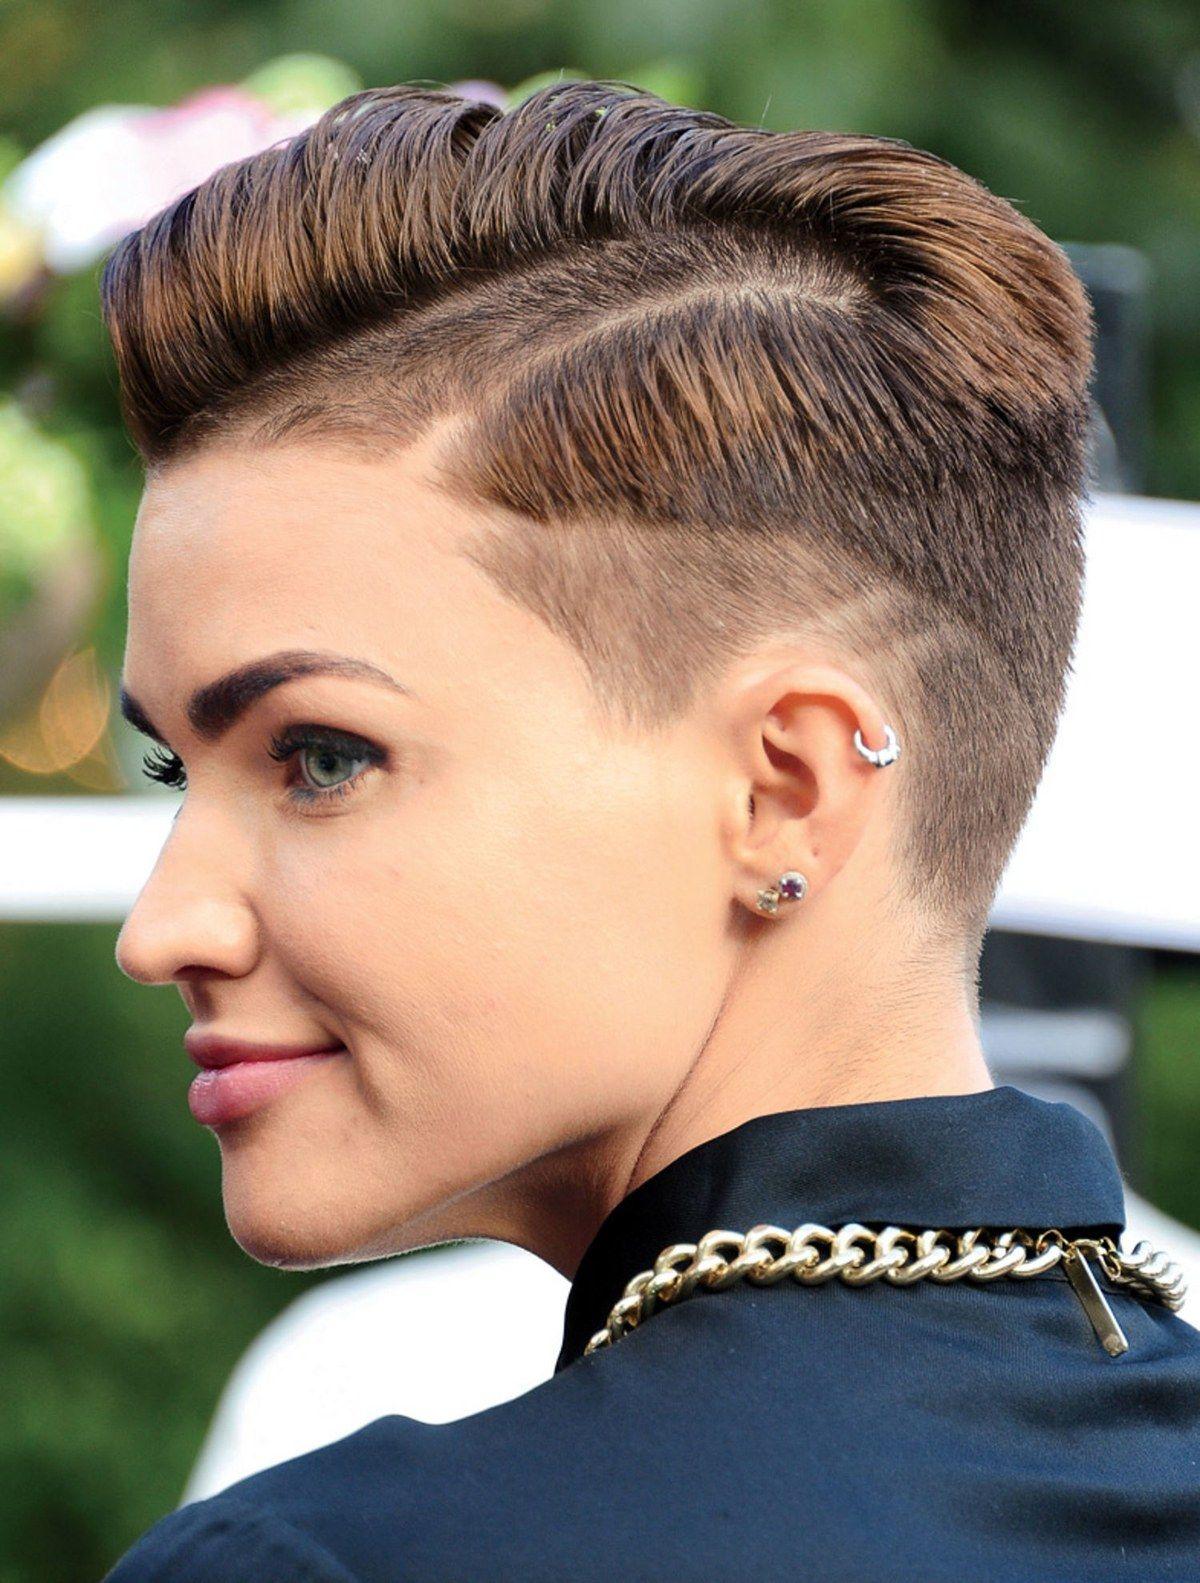 50 Cute Short Hairstyle And Haircut Ideas Worth Chopping Your Hair For This Winter Mit Bildern Haarschnitt Styling Kurzes Haar Kurz Geschnittene Frisuren